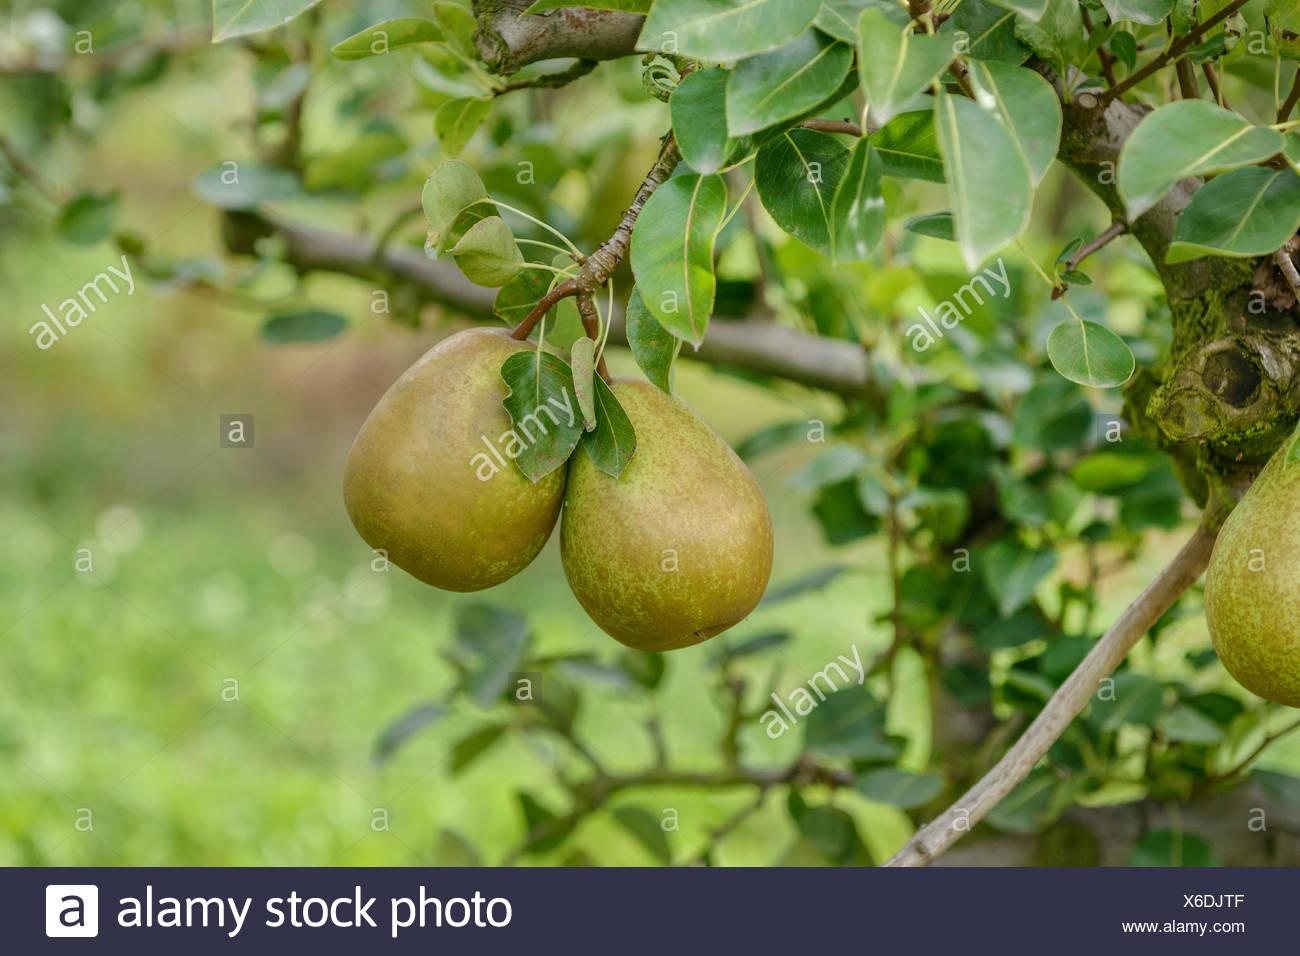 Common pear (Pyrus communis 'Pierre Corneille', Pyrus communis Pierre Corneille), peras on a tree, cultivar Pierre Corneille, Germany - Stock Image